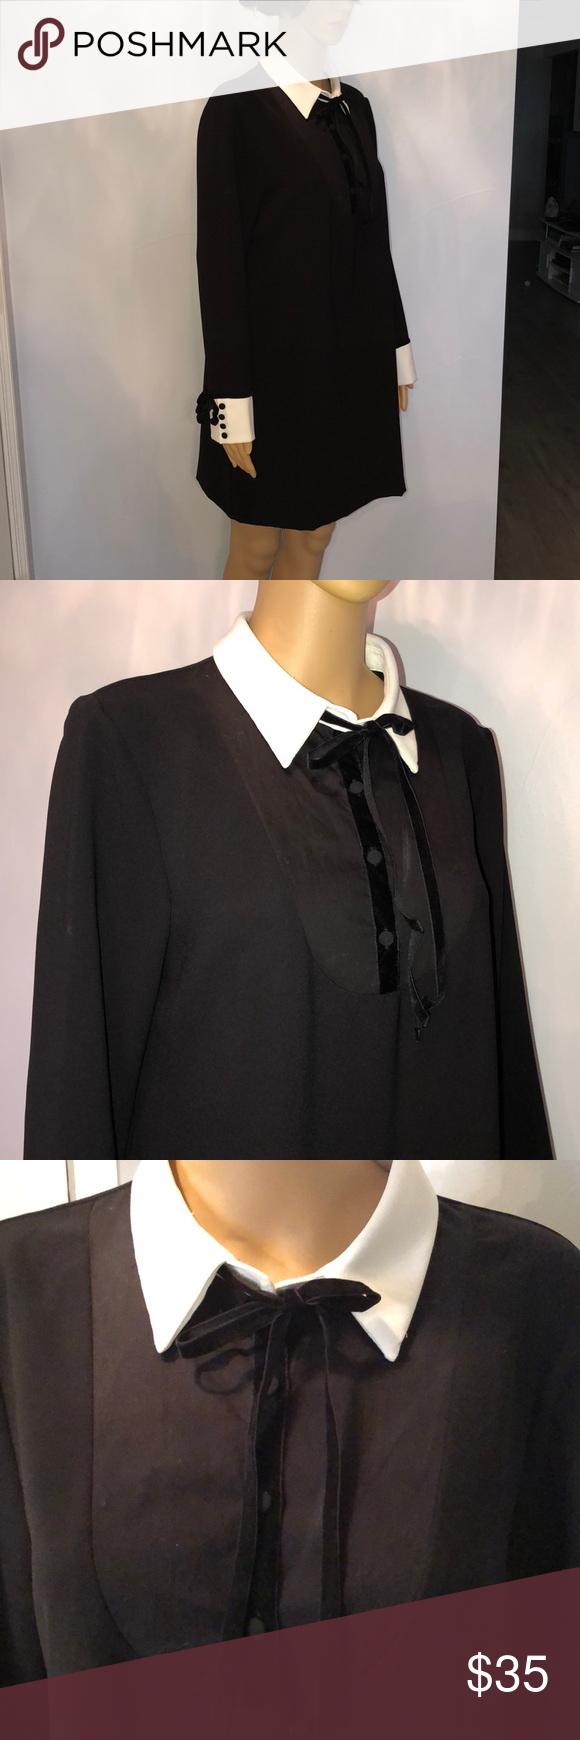 Zara New Black Dress With A White Collar And Cuffs Brand New Stretch Knit Cotton Dress Bust 42 Length 34 5 Zara Dresses Mini New Black Black Dress Zara New [ 1740 x 580 Pixel ]